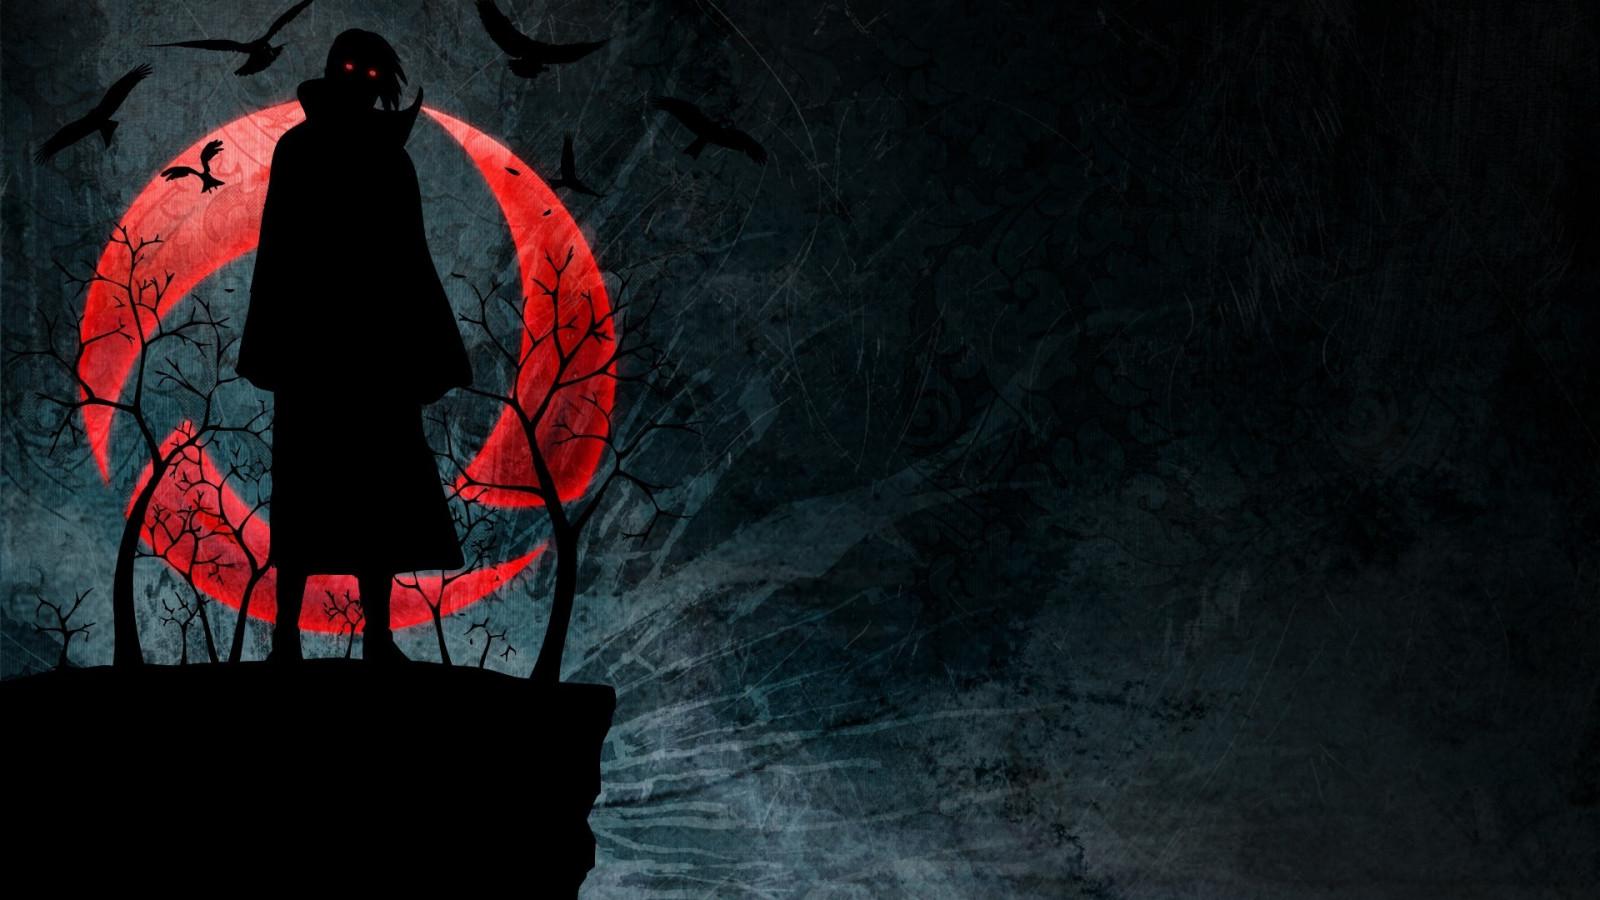 Silhouette Naruto Shippuuden Sharingan Akatsuki Uchiha Itachi Darkness Screenshot 1920x1080 Px Computer Wallpaper